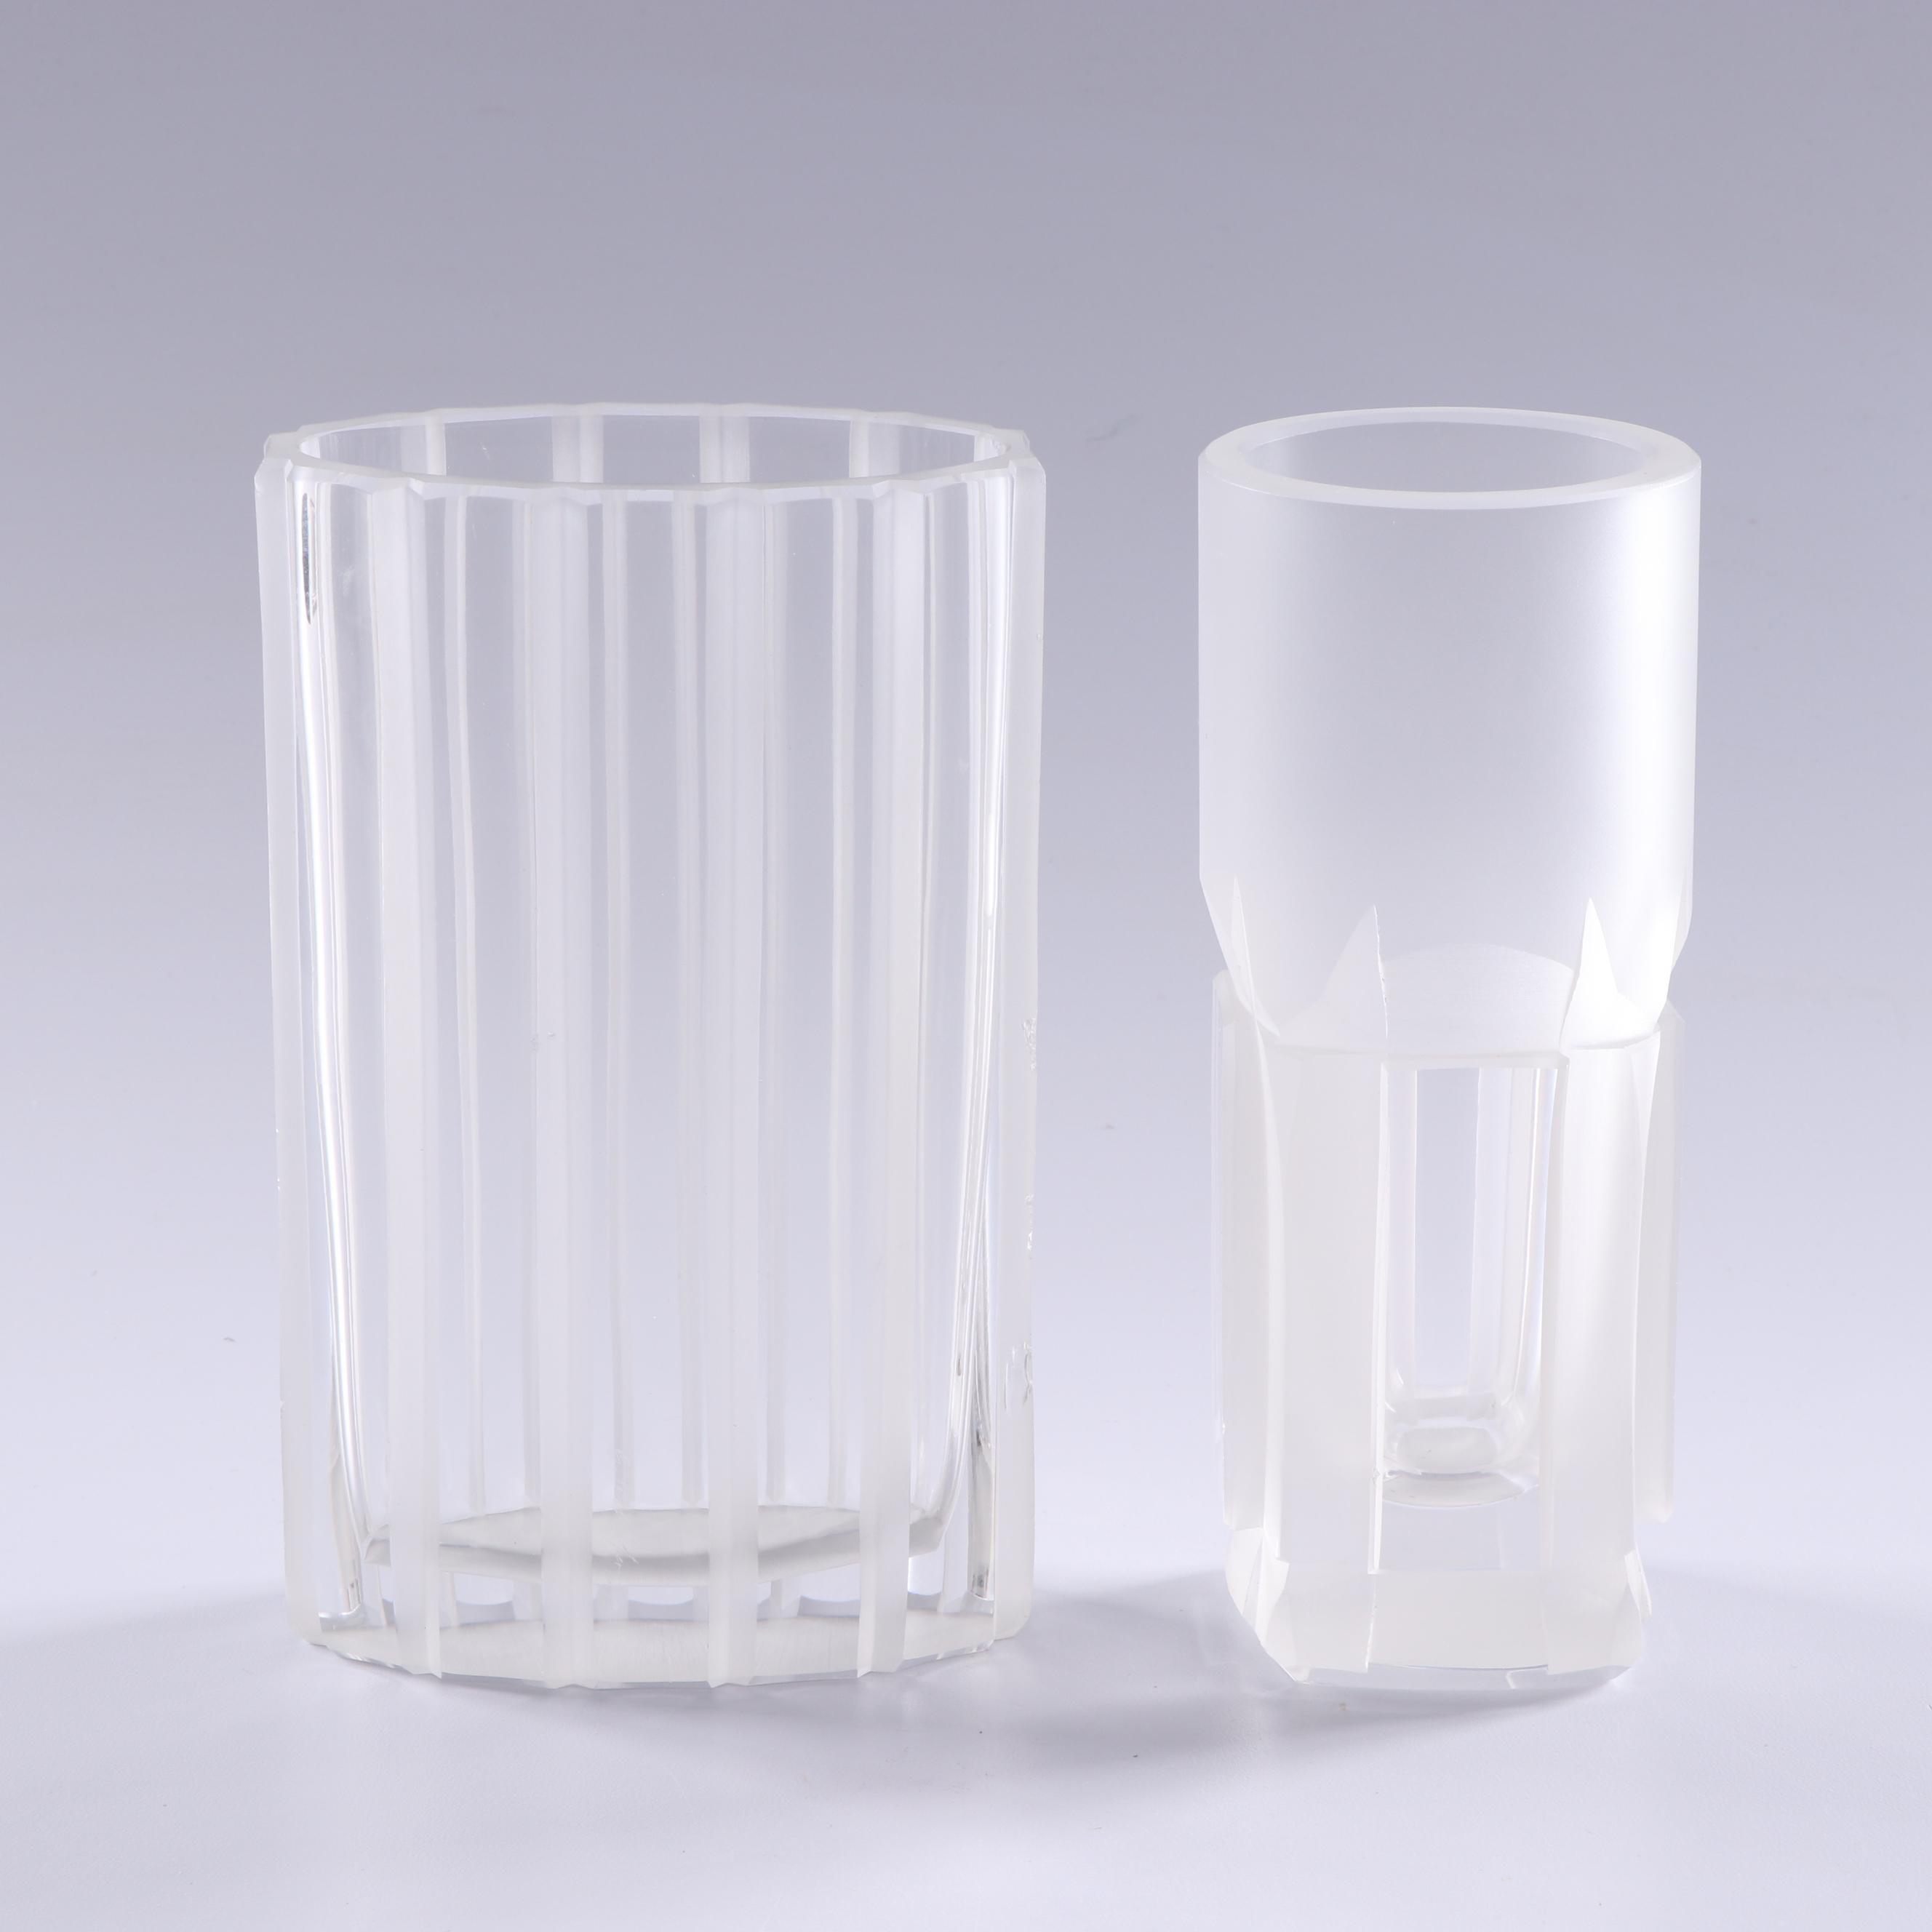 Gernot Schluifer Art Glass Vases, 1975